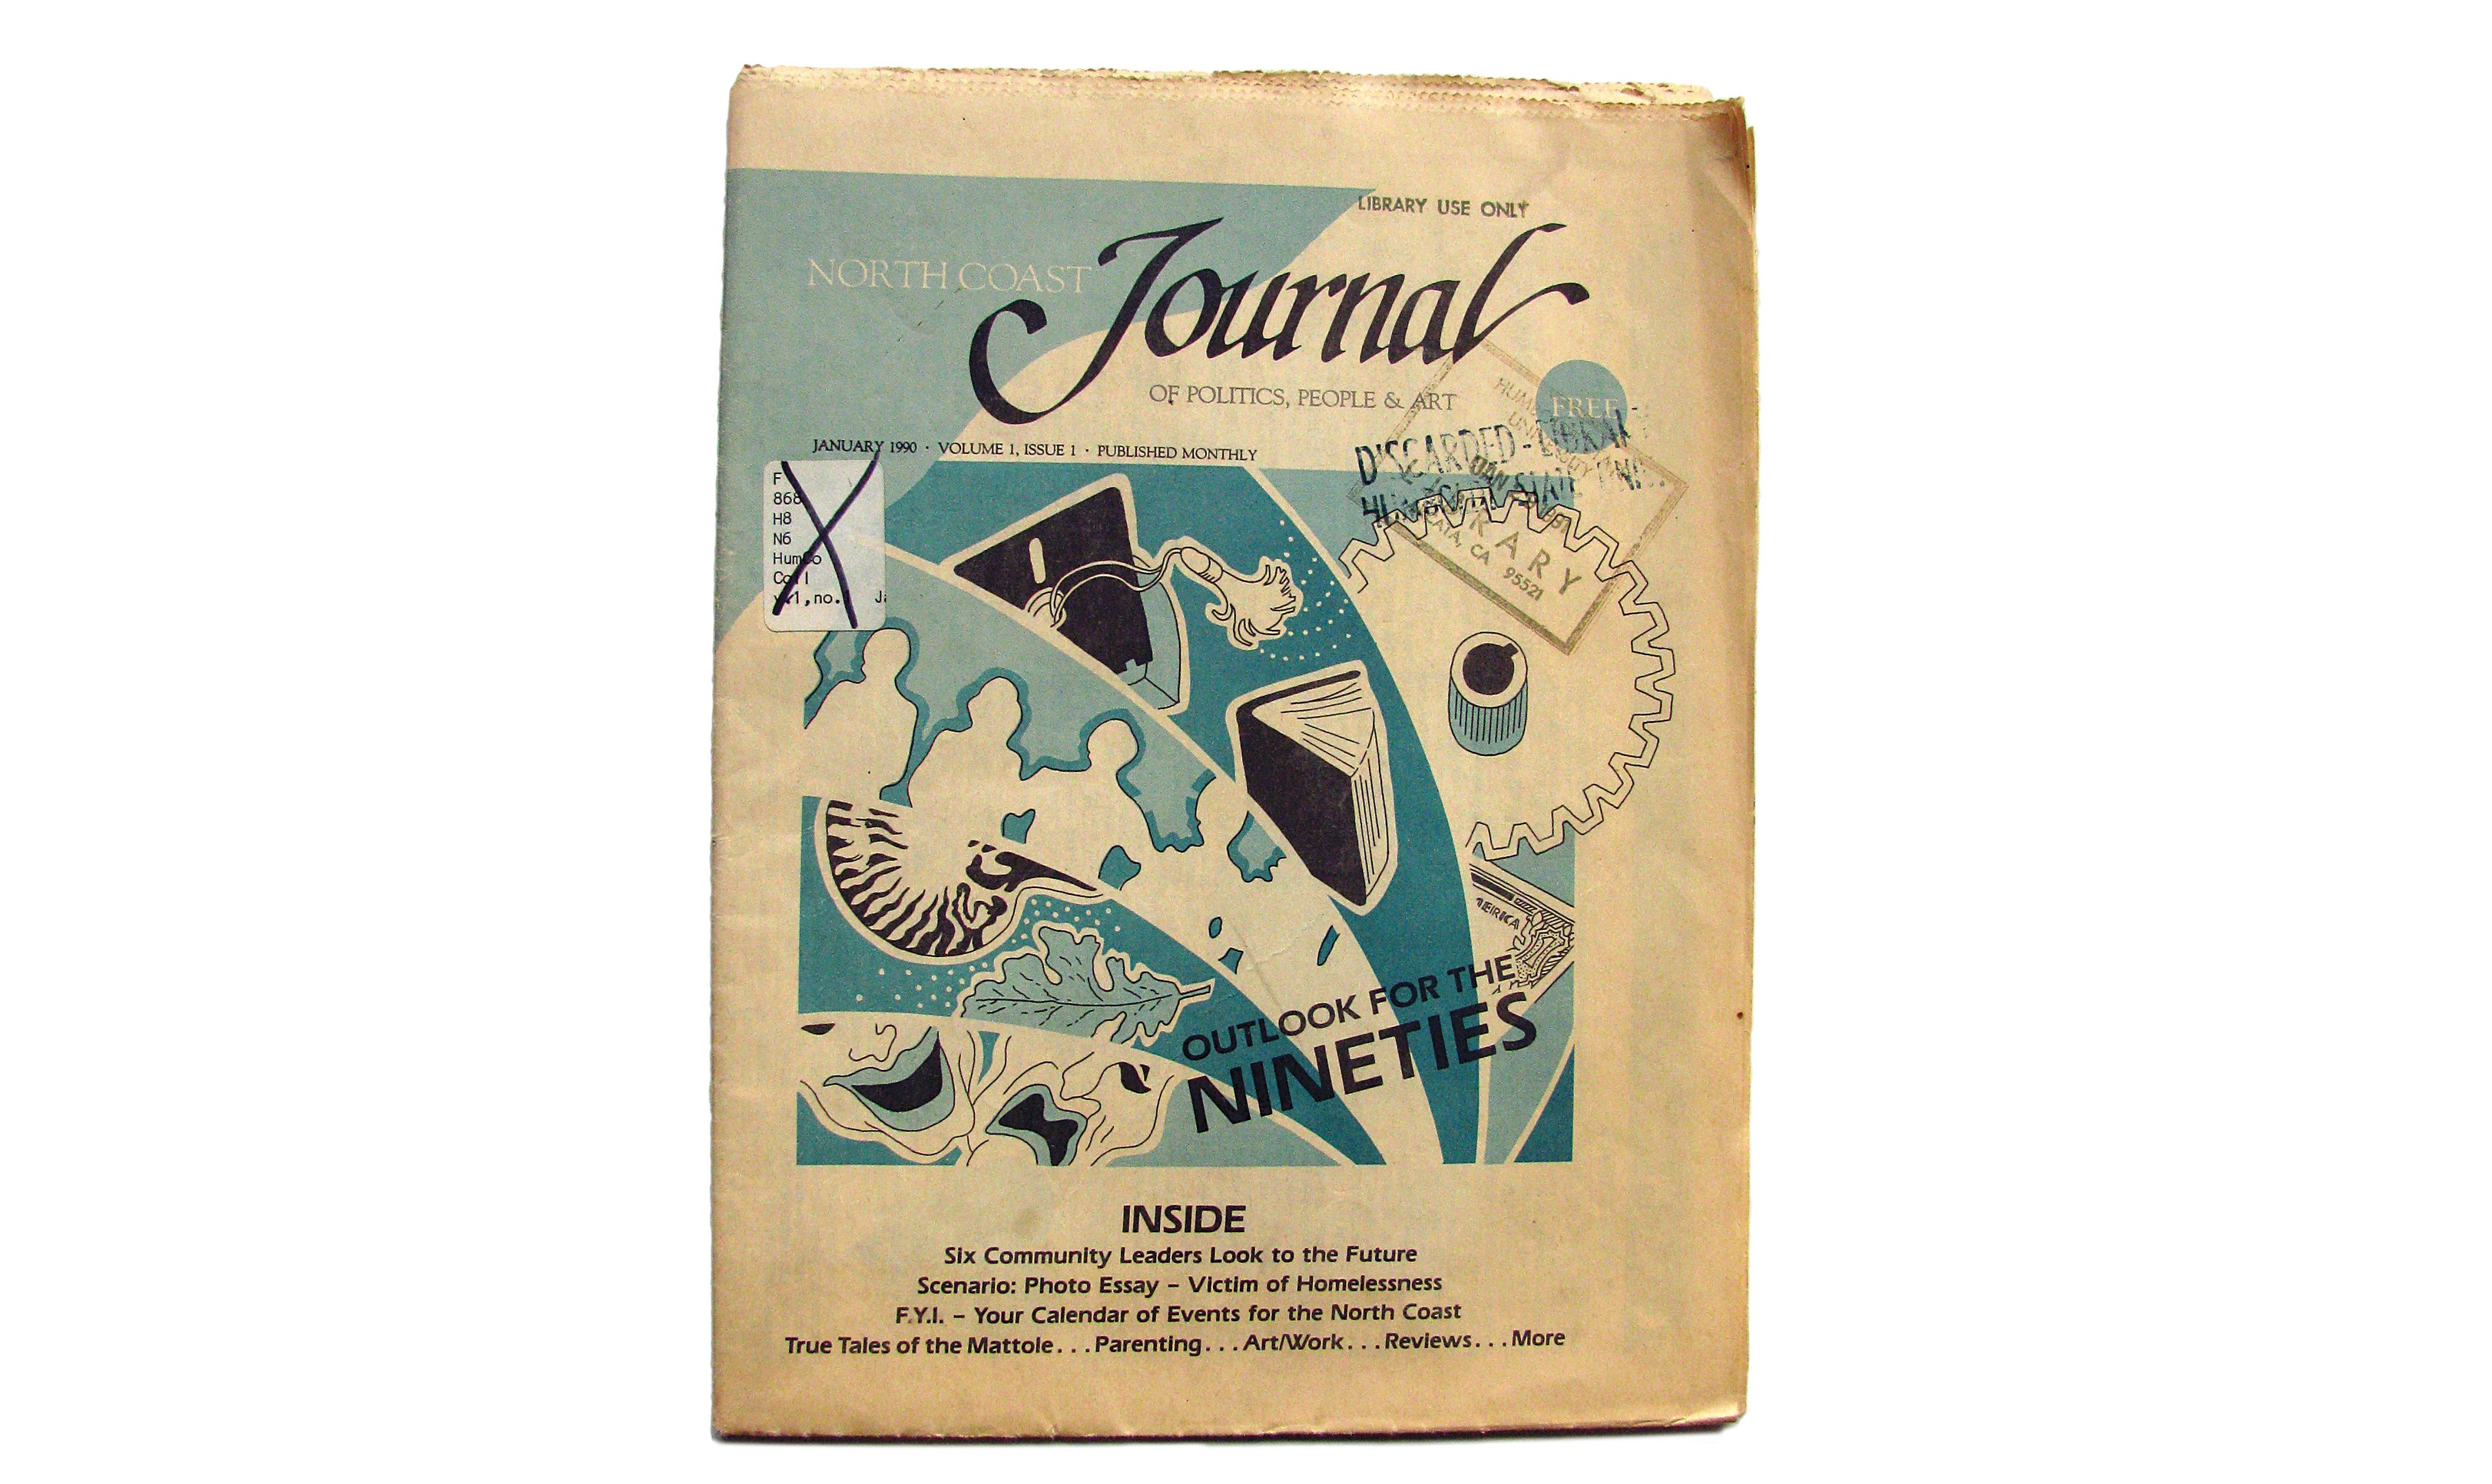 North Coast Journal January 1990, Volume 1, Issue 1